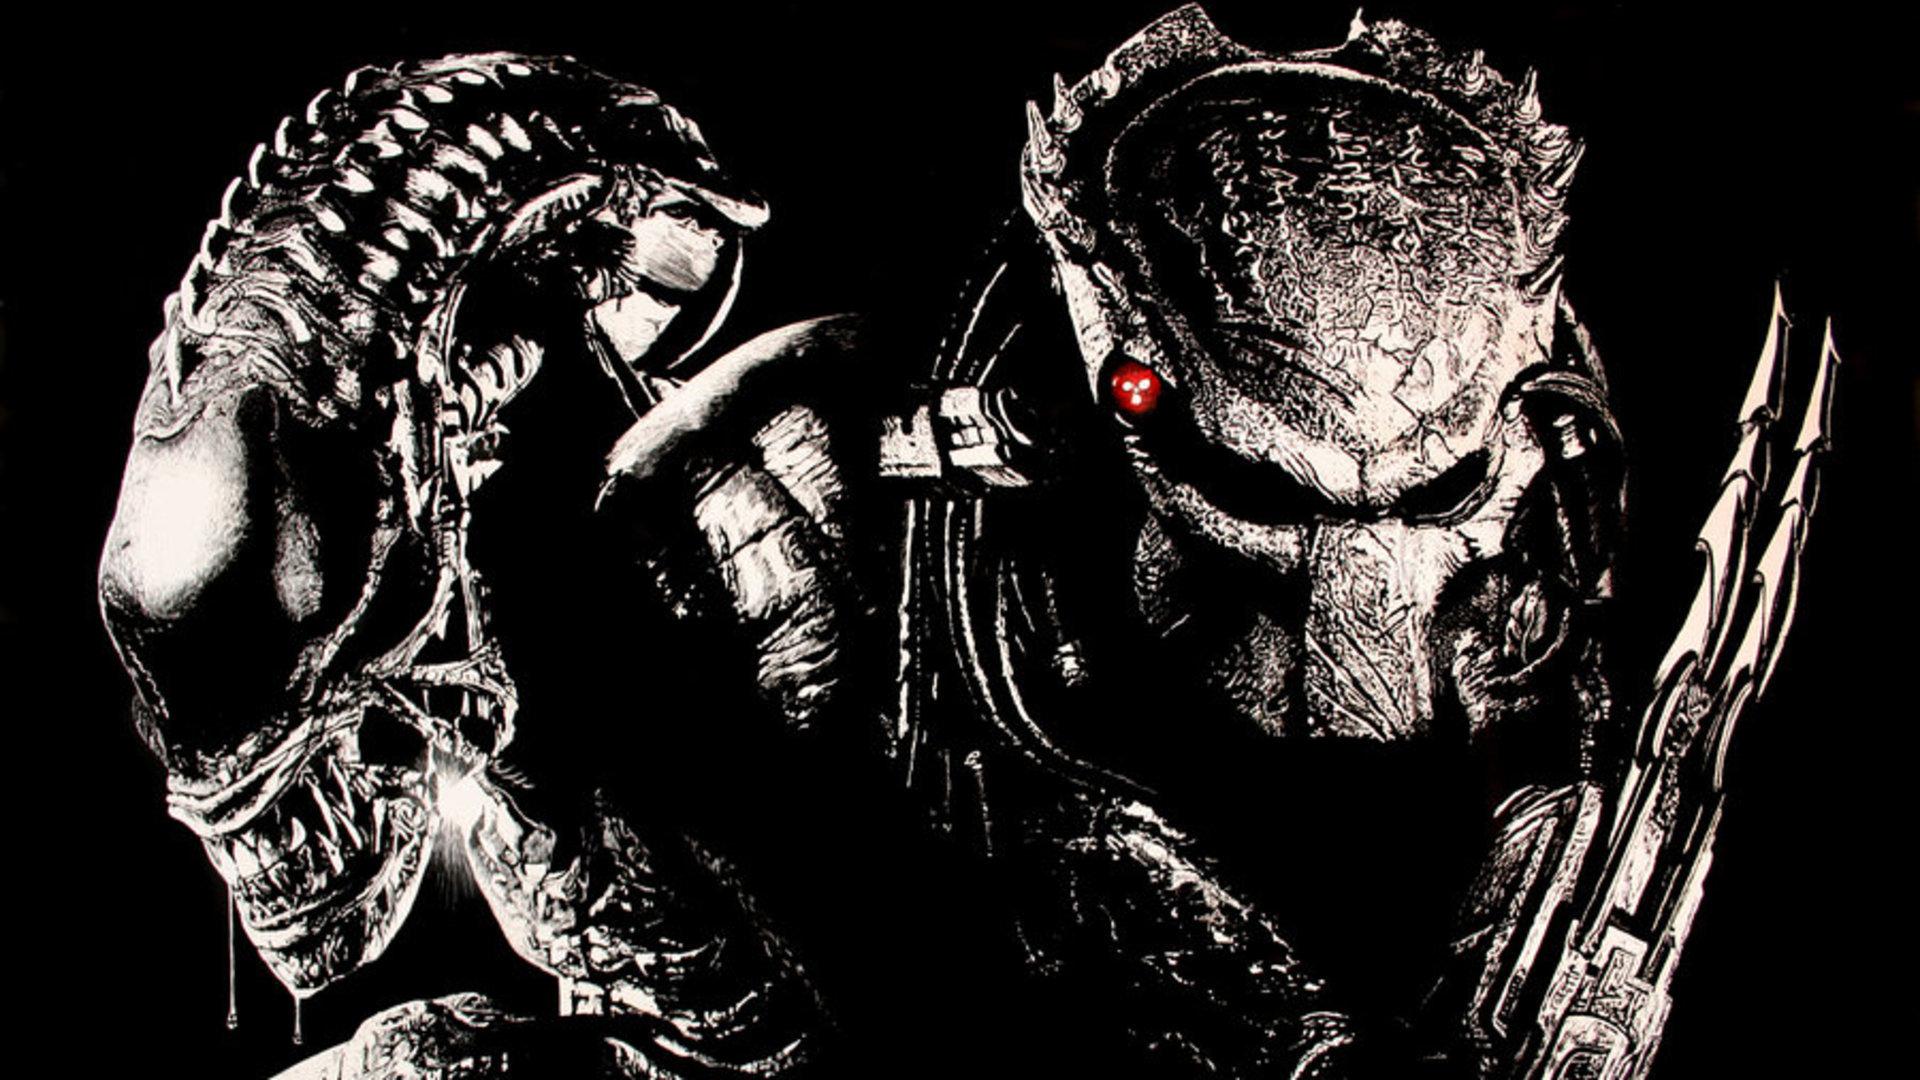 Awesome AVP Alien Vs Predator Movie Free Wallpaper ID270174 For Full Hd PC